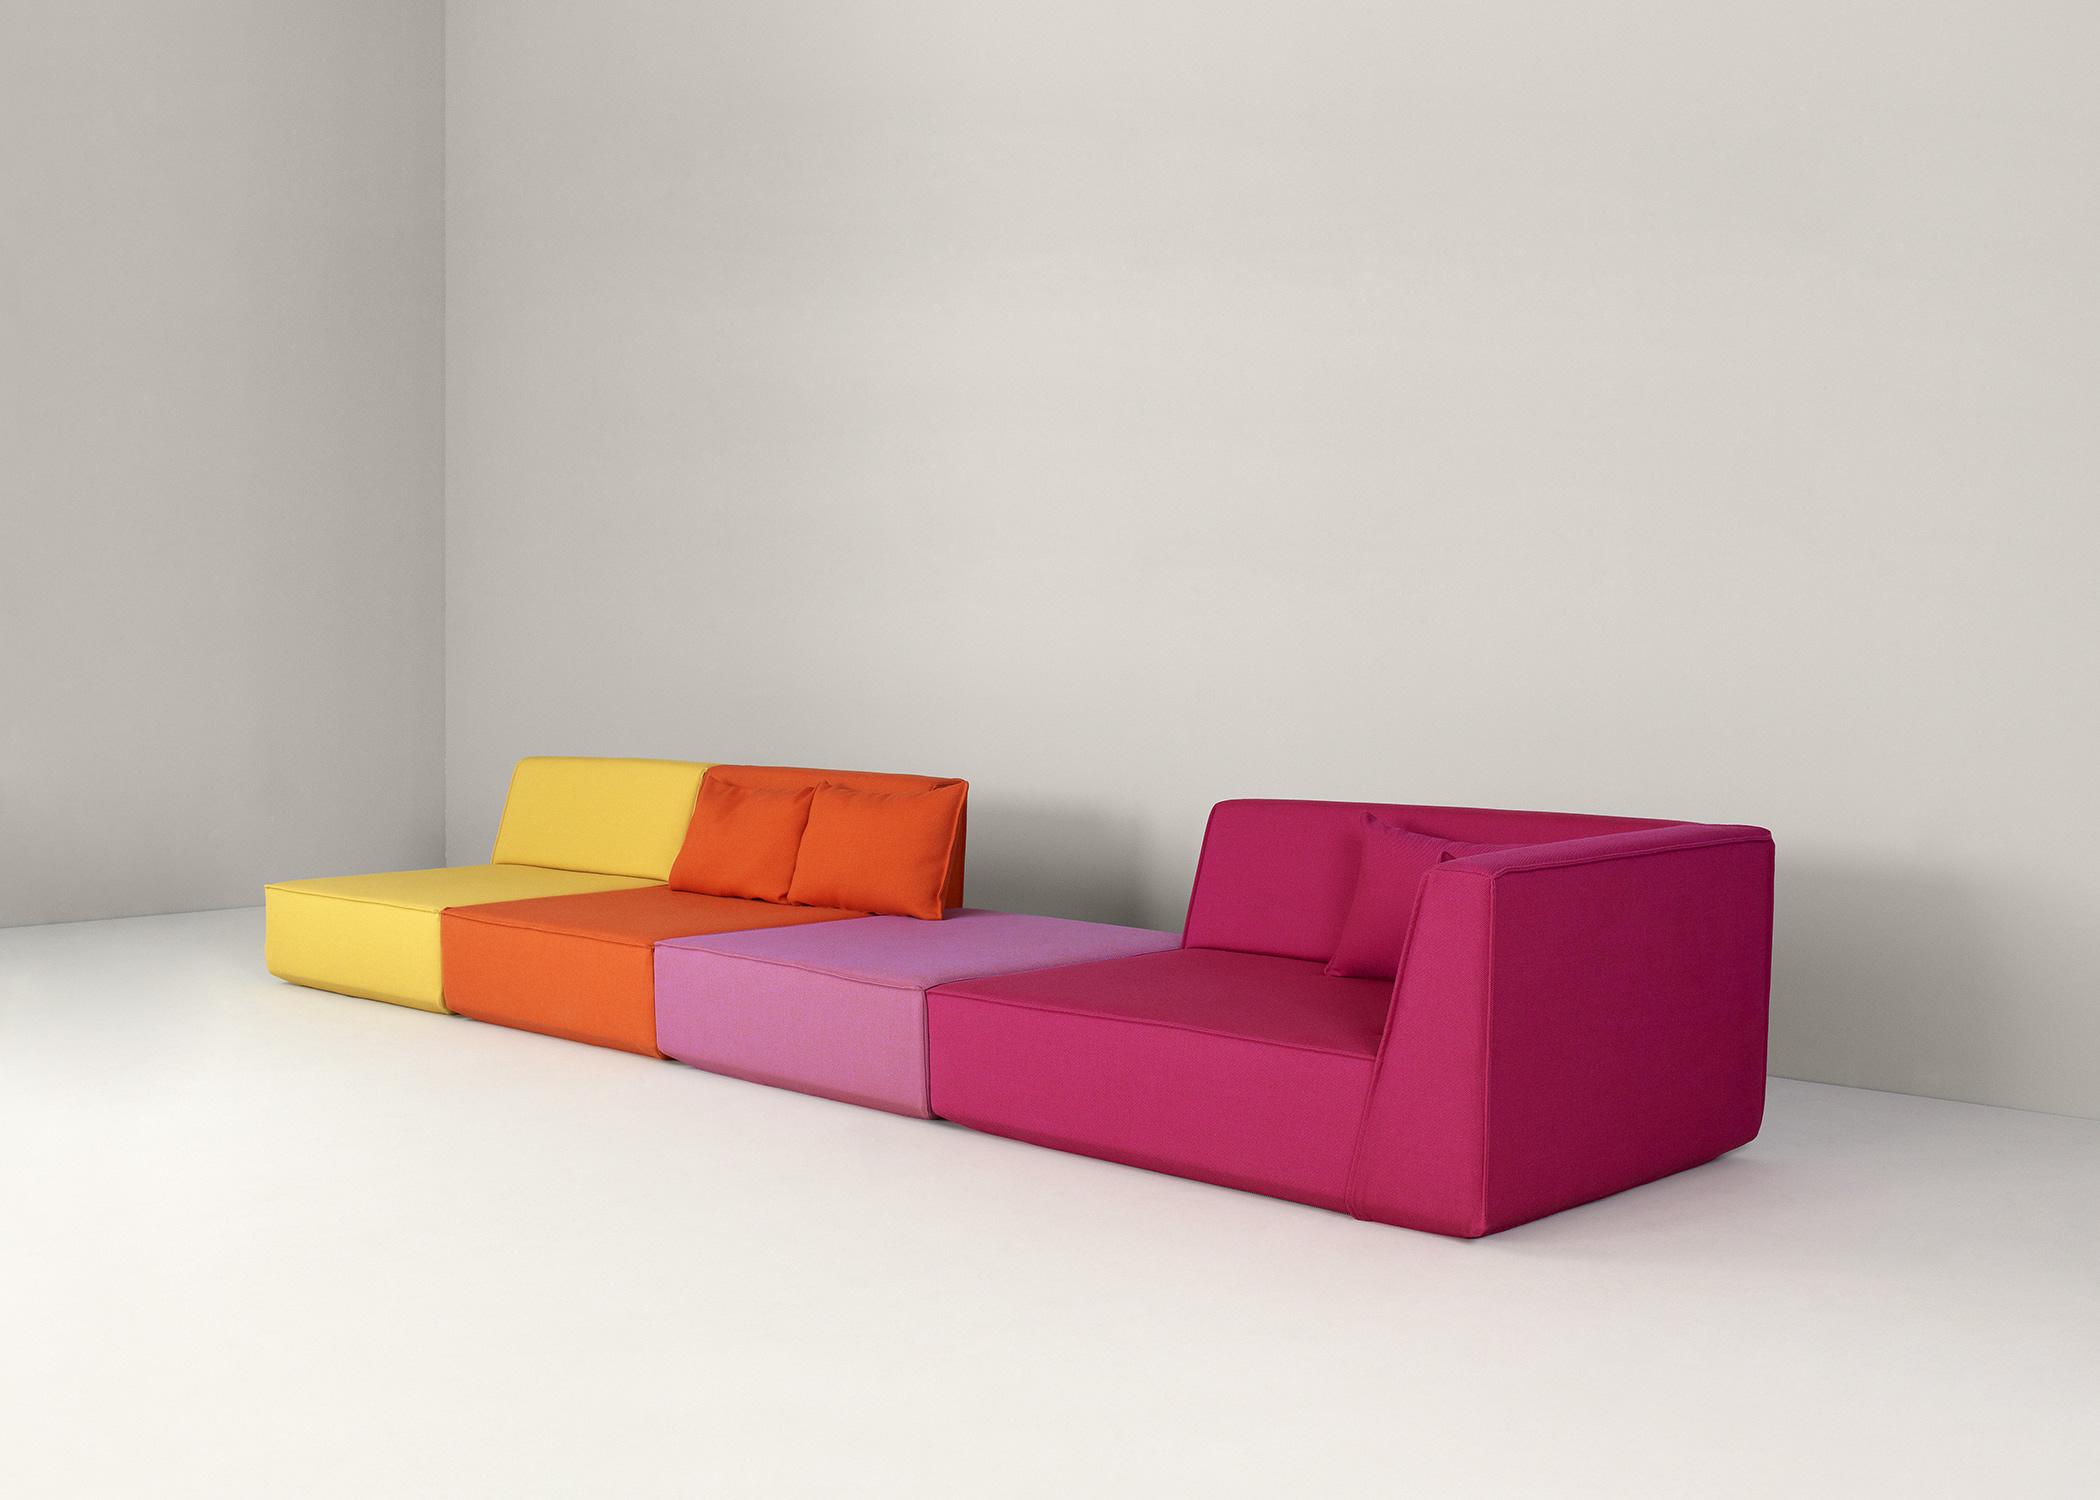 Cubit Sofa By Olaf Schroeder For Cubit